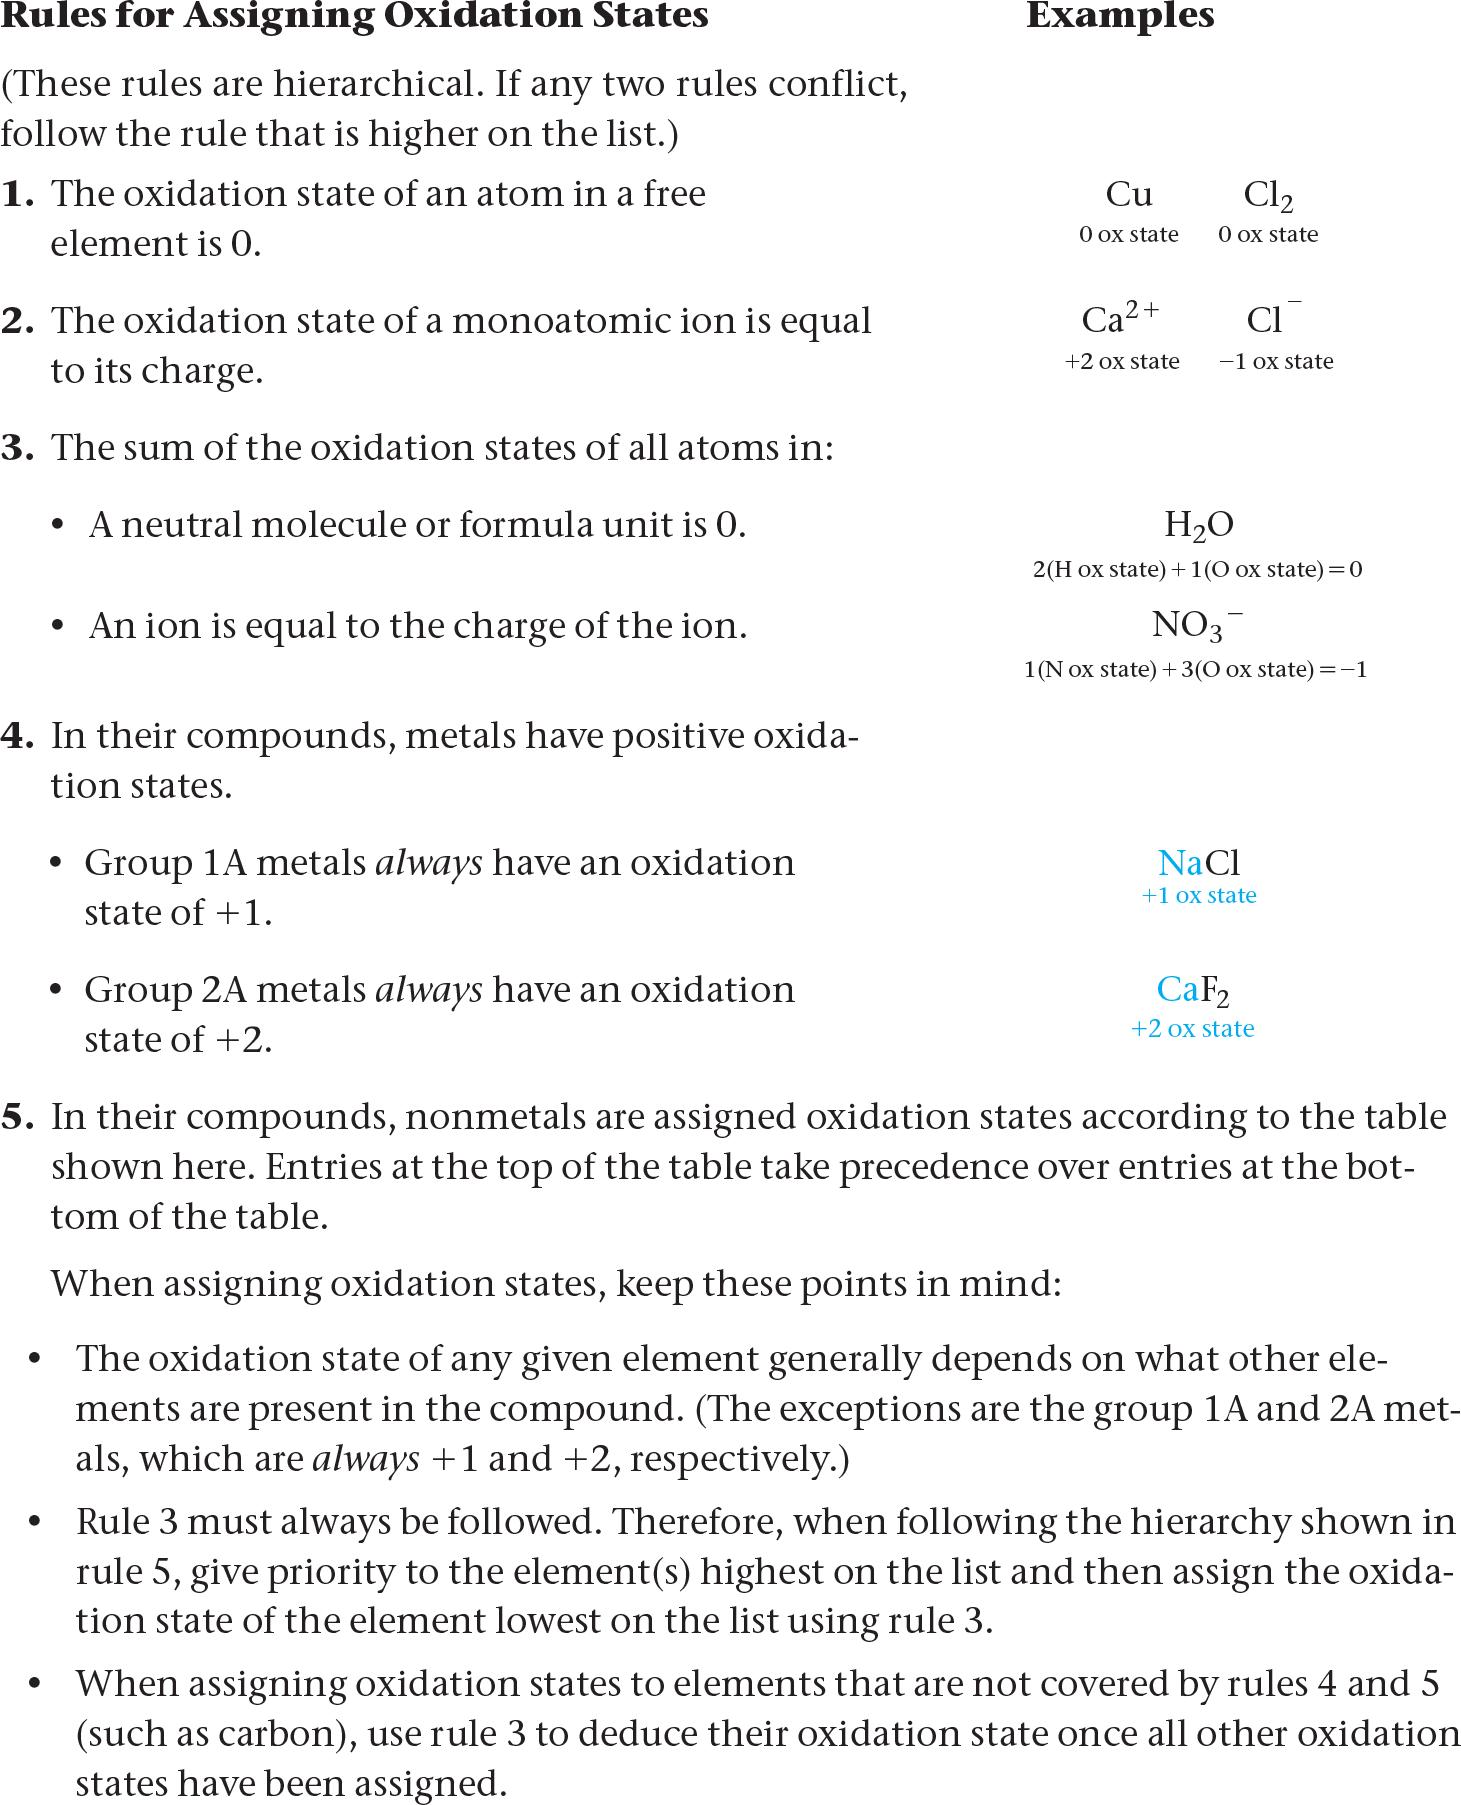 Oxidation And Reduction Worksheet Answer Key